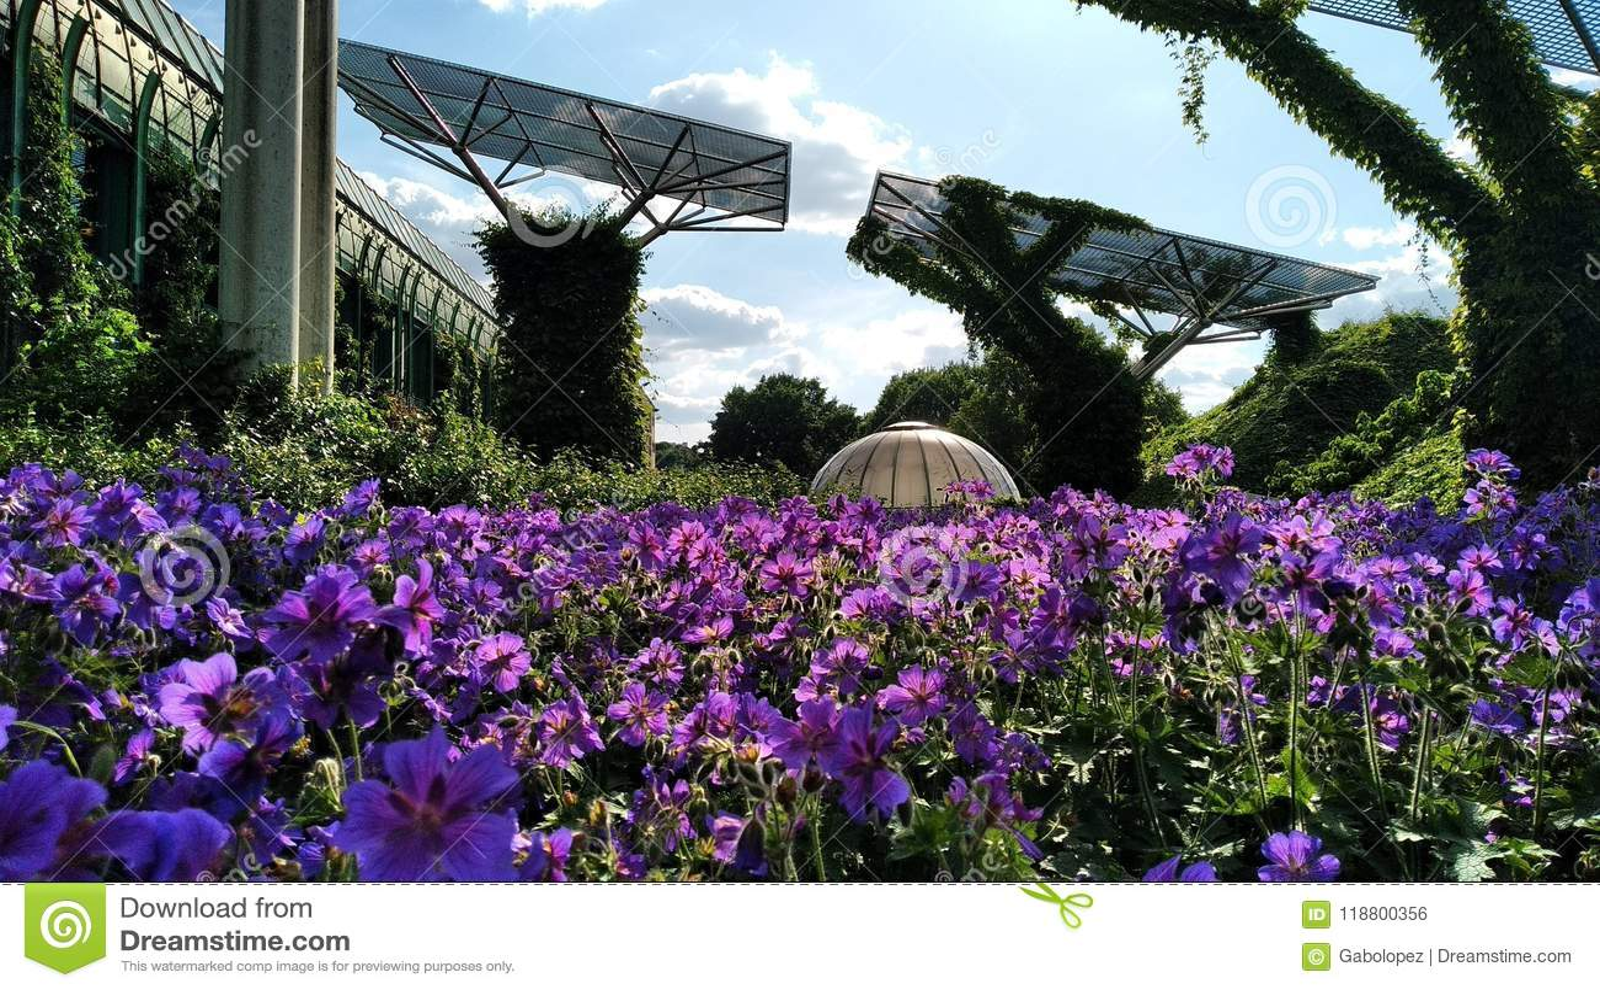 Warsaw gardens